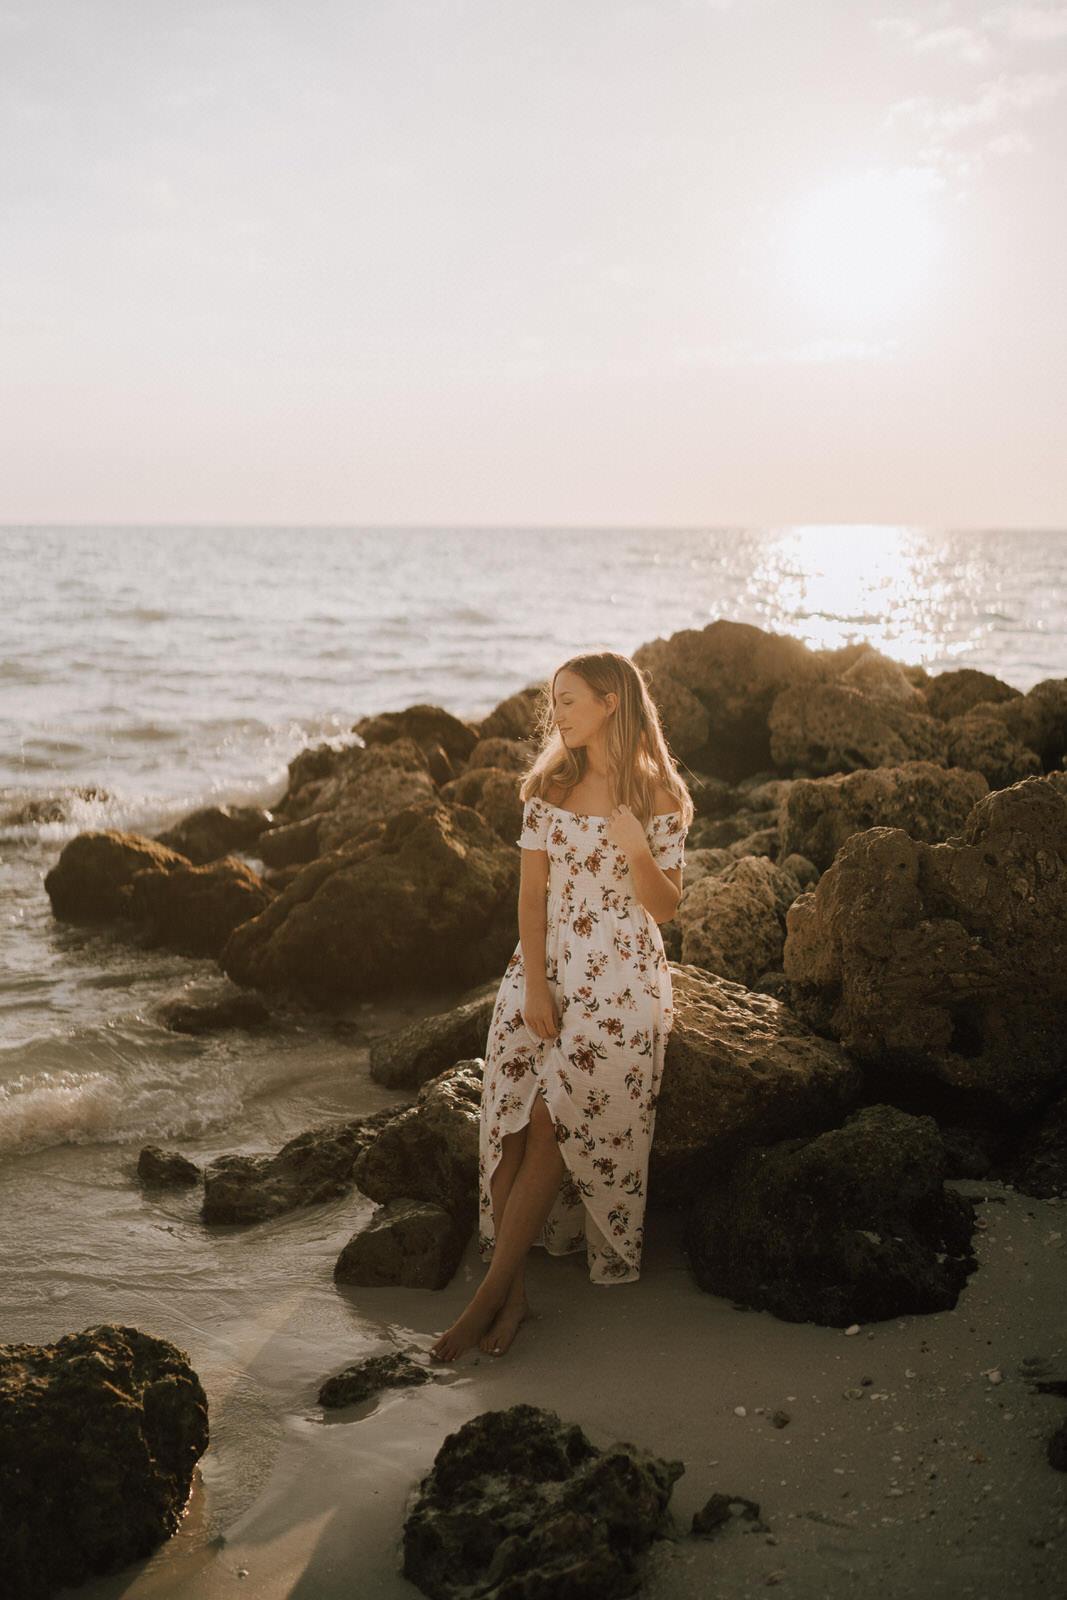 Fort Myers Senior Photos on Bonita Beach - Michelle Gonzalez Photography - Sammie-50.JPG